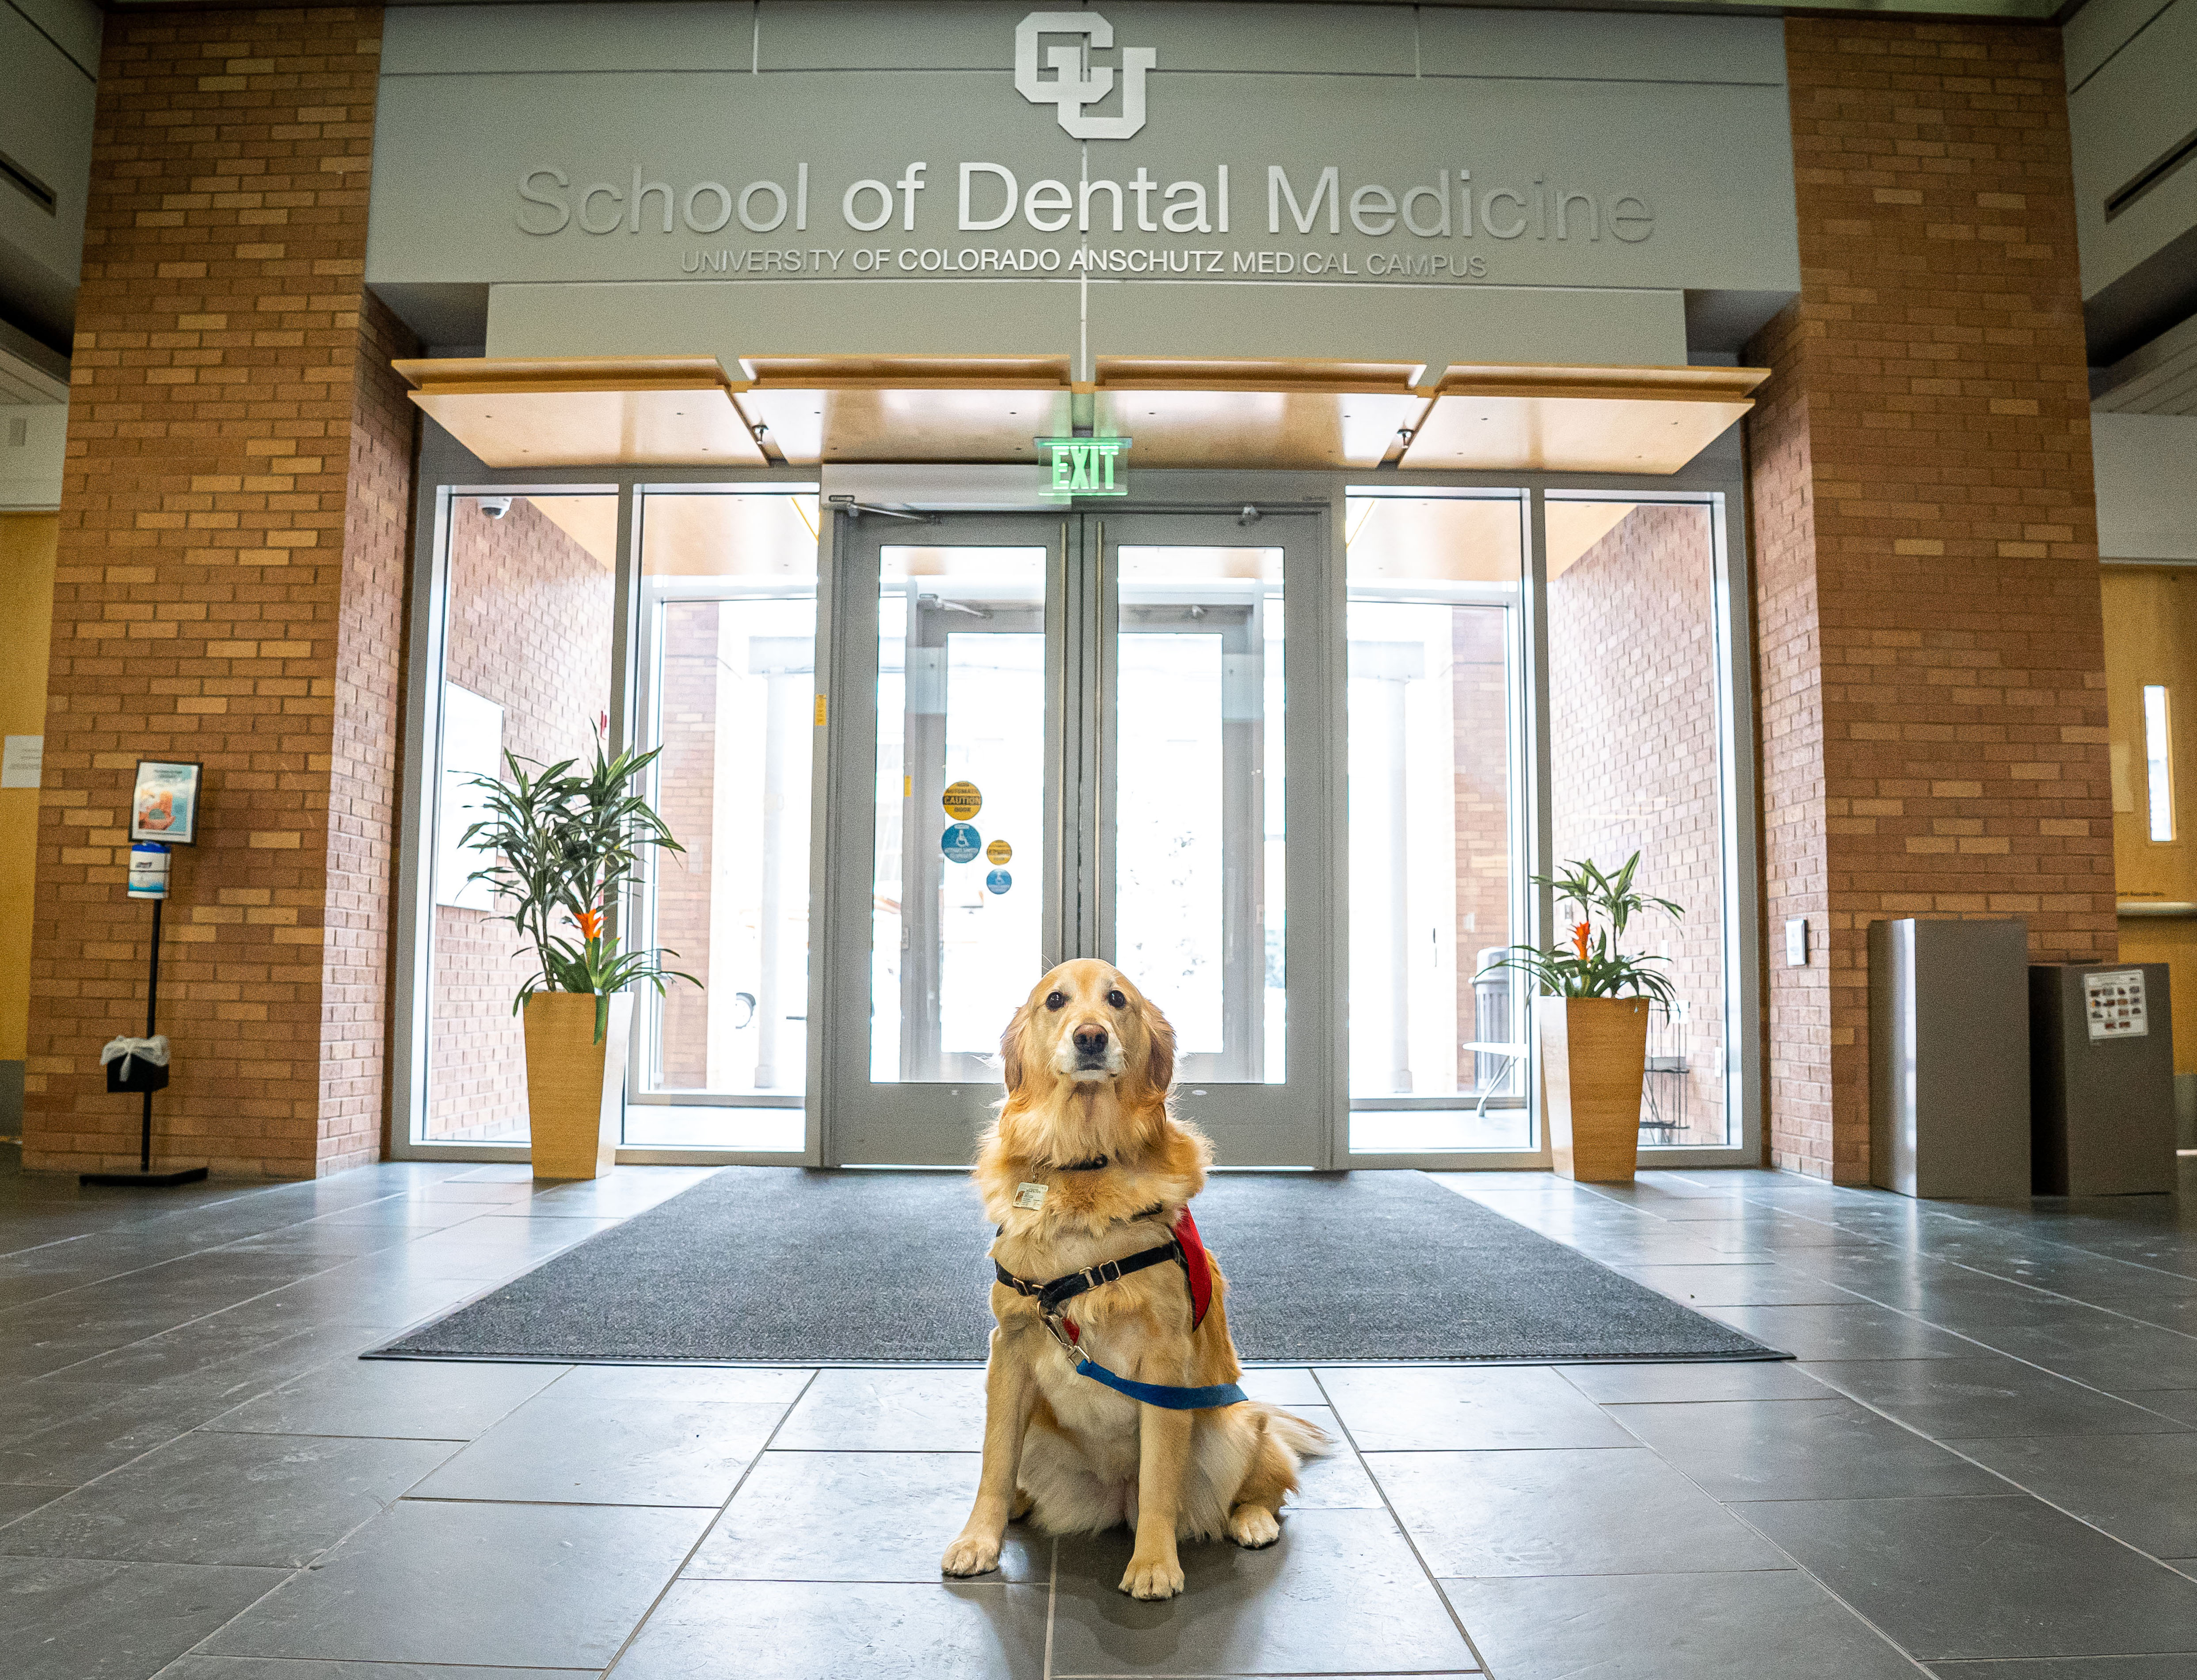 DogTherapyDog&Entry